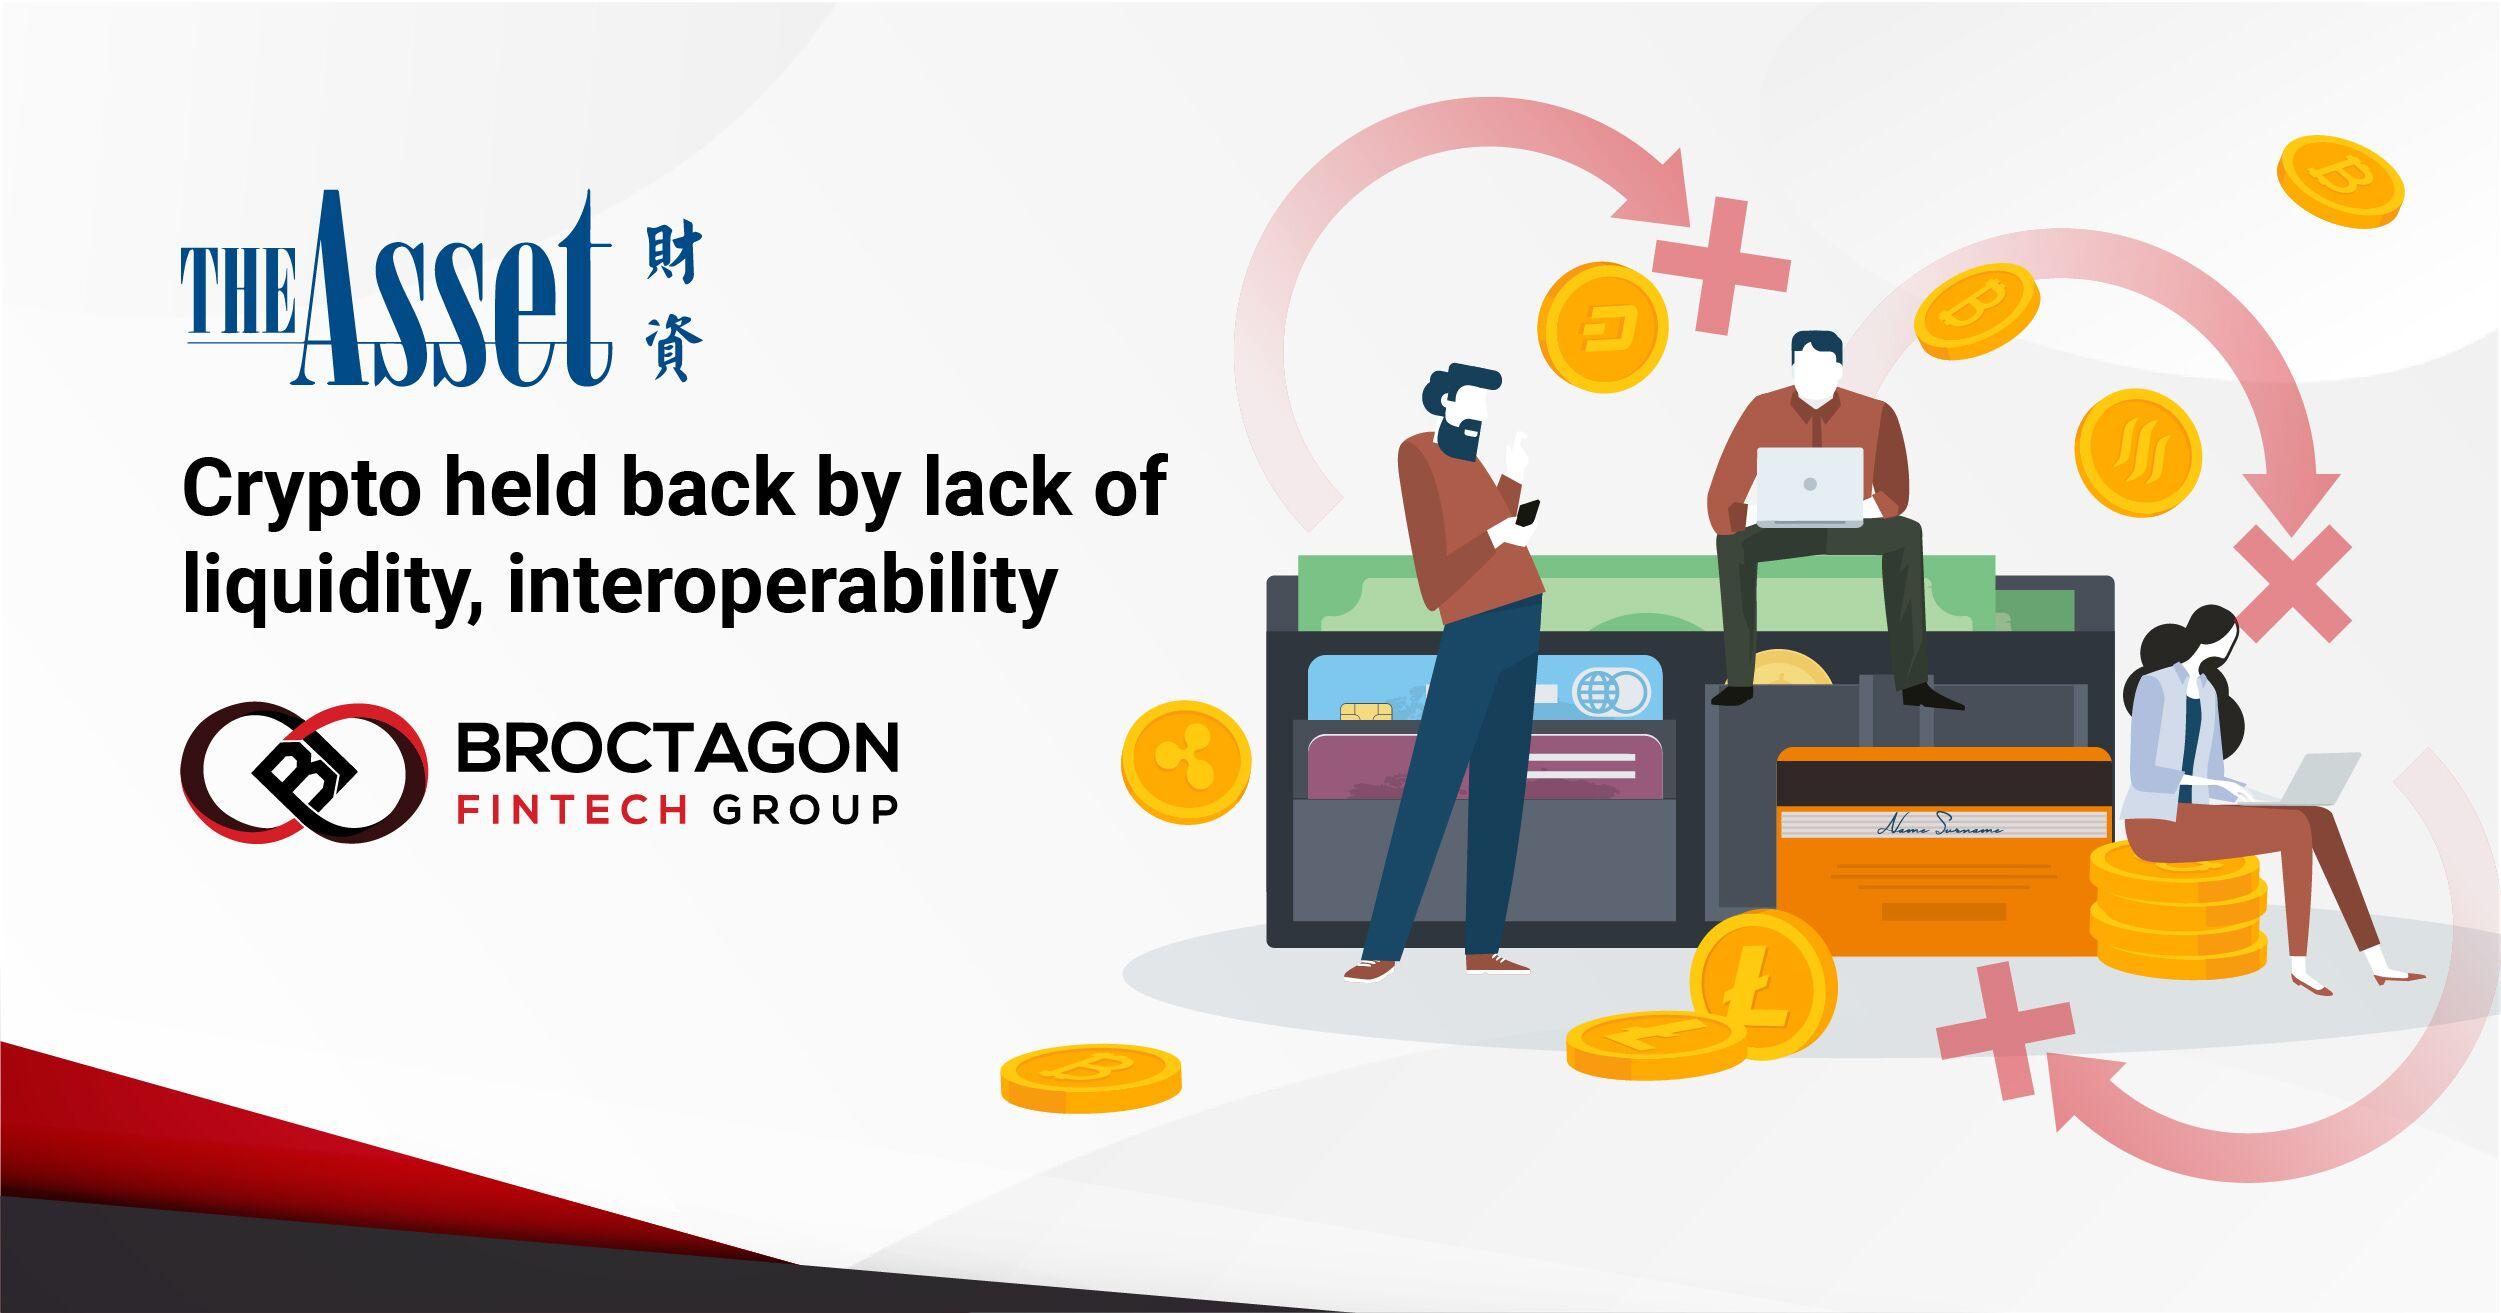 Crypto held back by lack of liquidity, interoperability